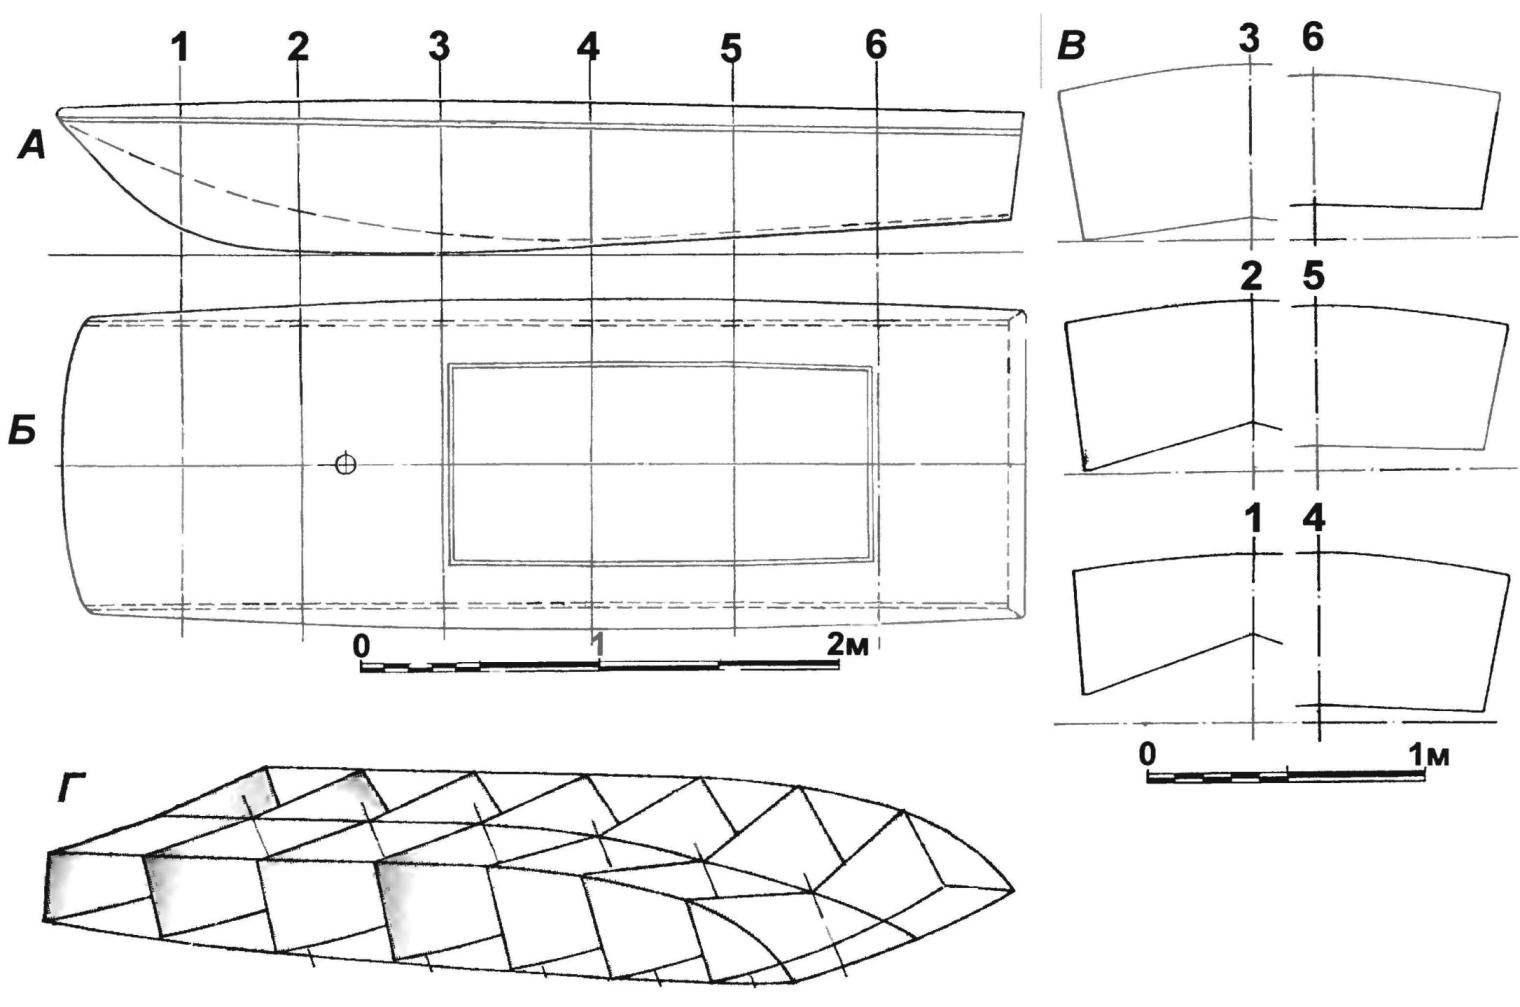 Теоретический чертеж корпуса швертбота